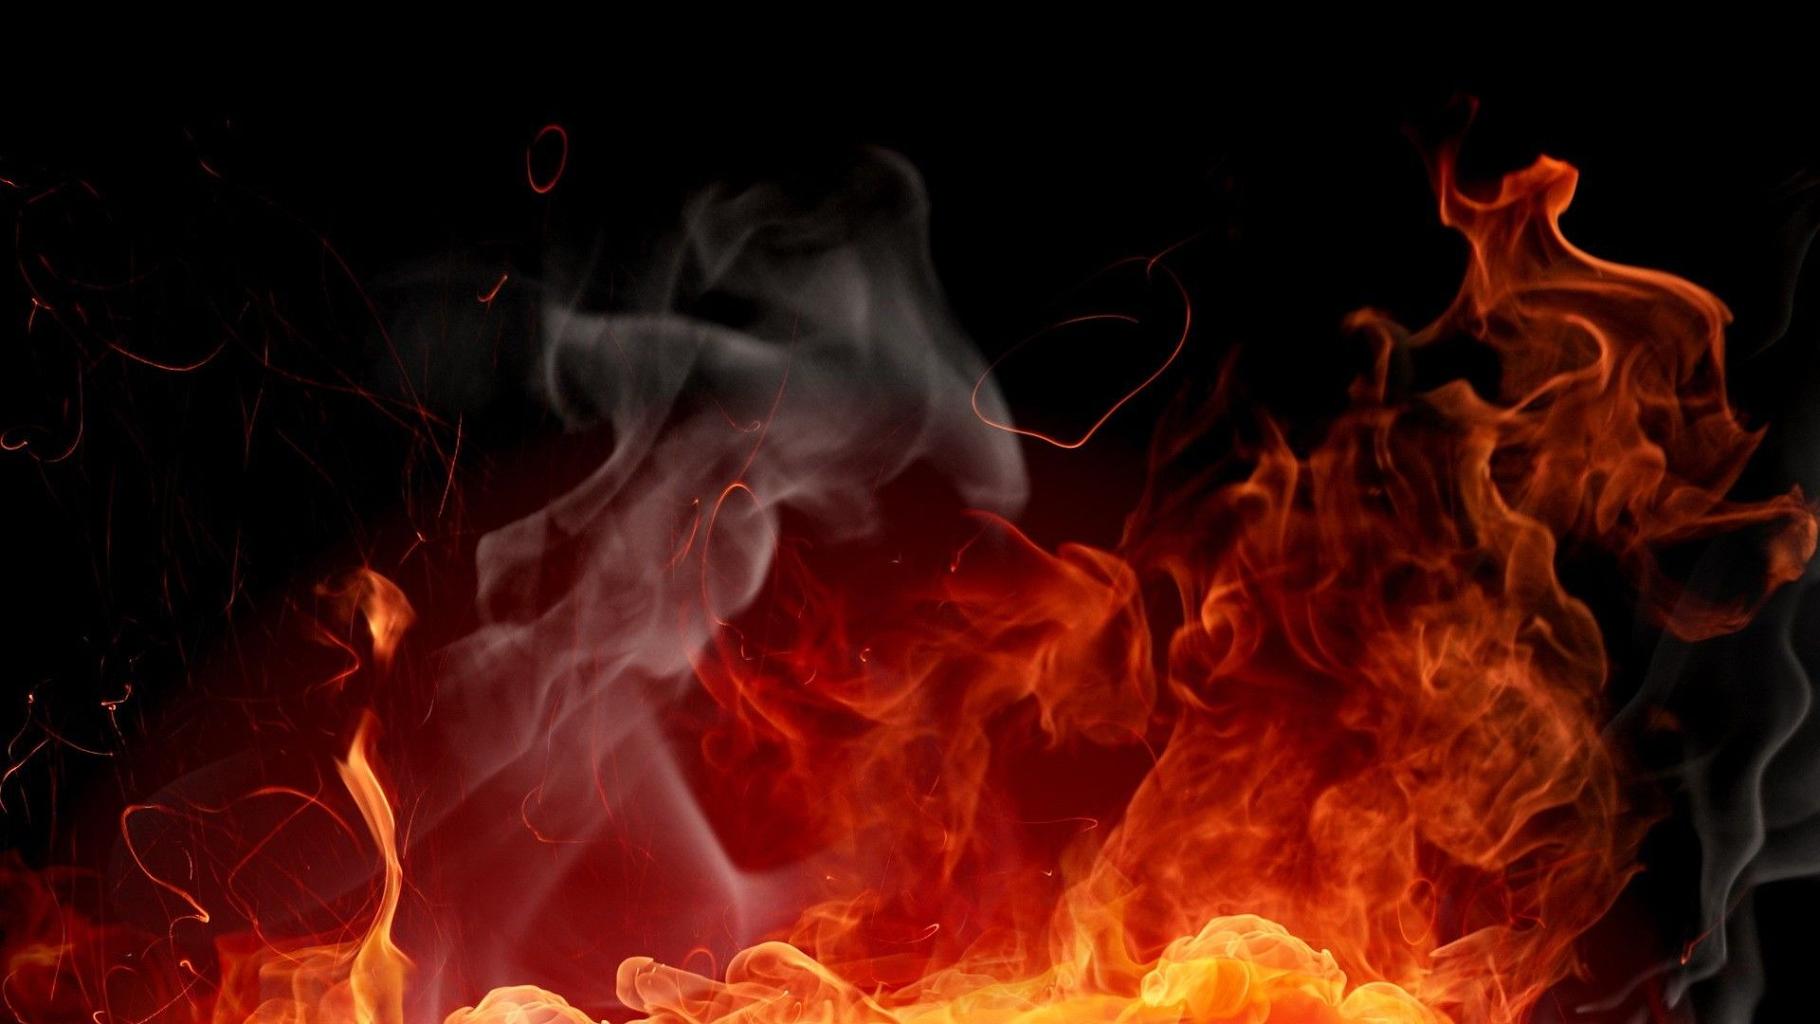 Fire HD PNG - 89215